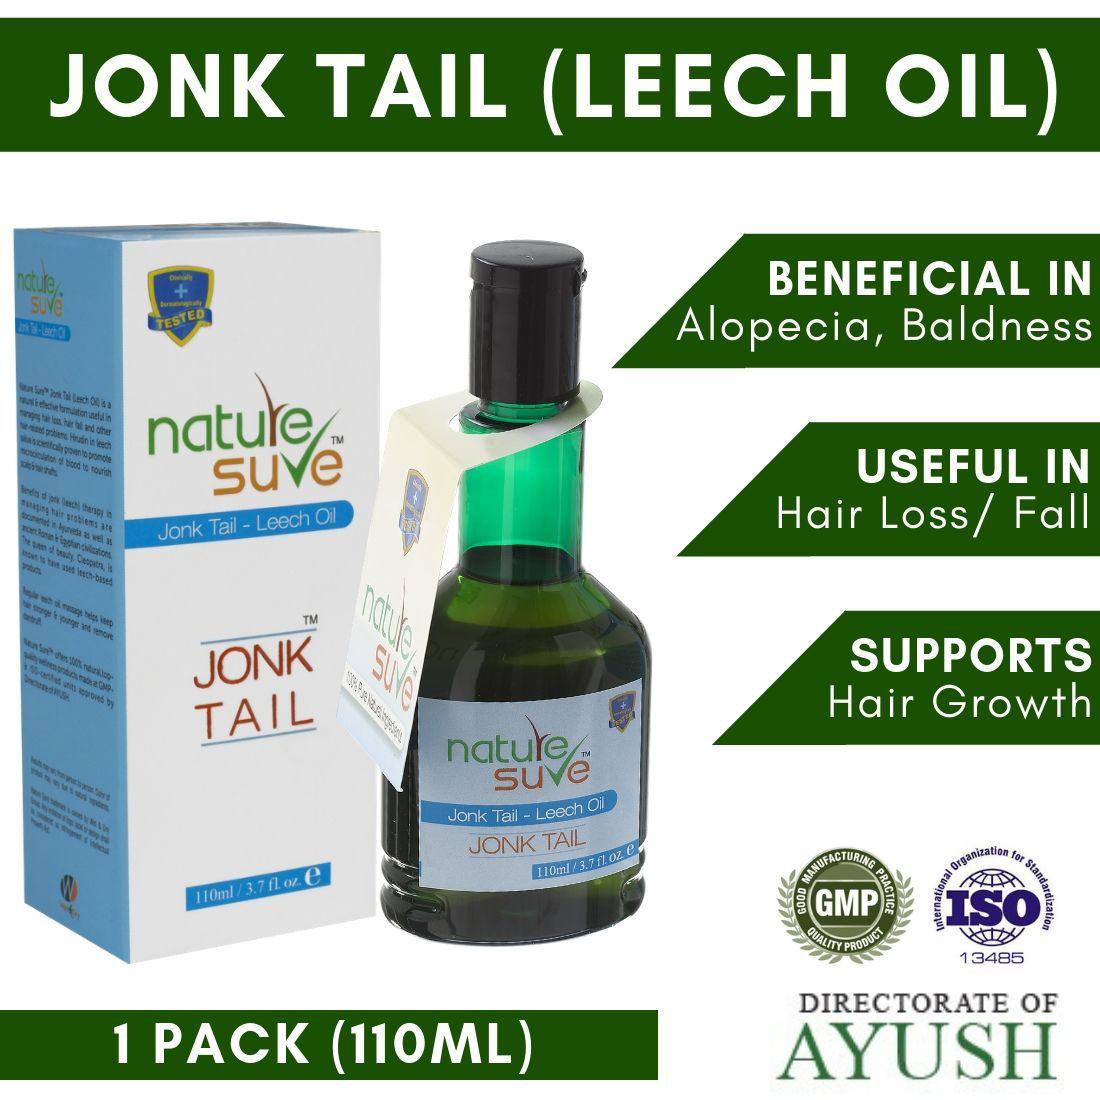 Nature Sure Jonk Tail (Leech Oil) Carrier Oil 110 mL